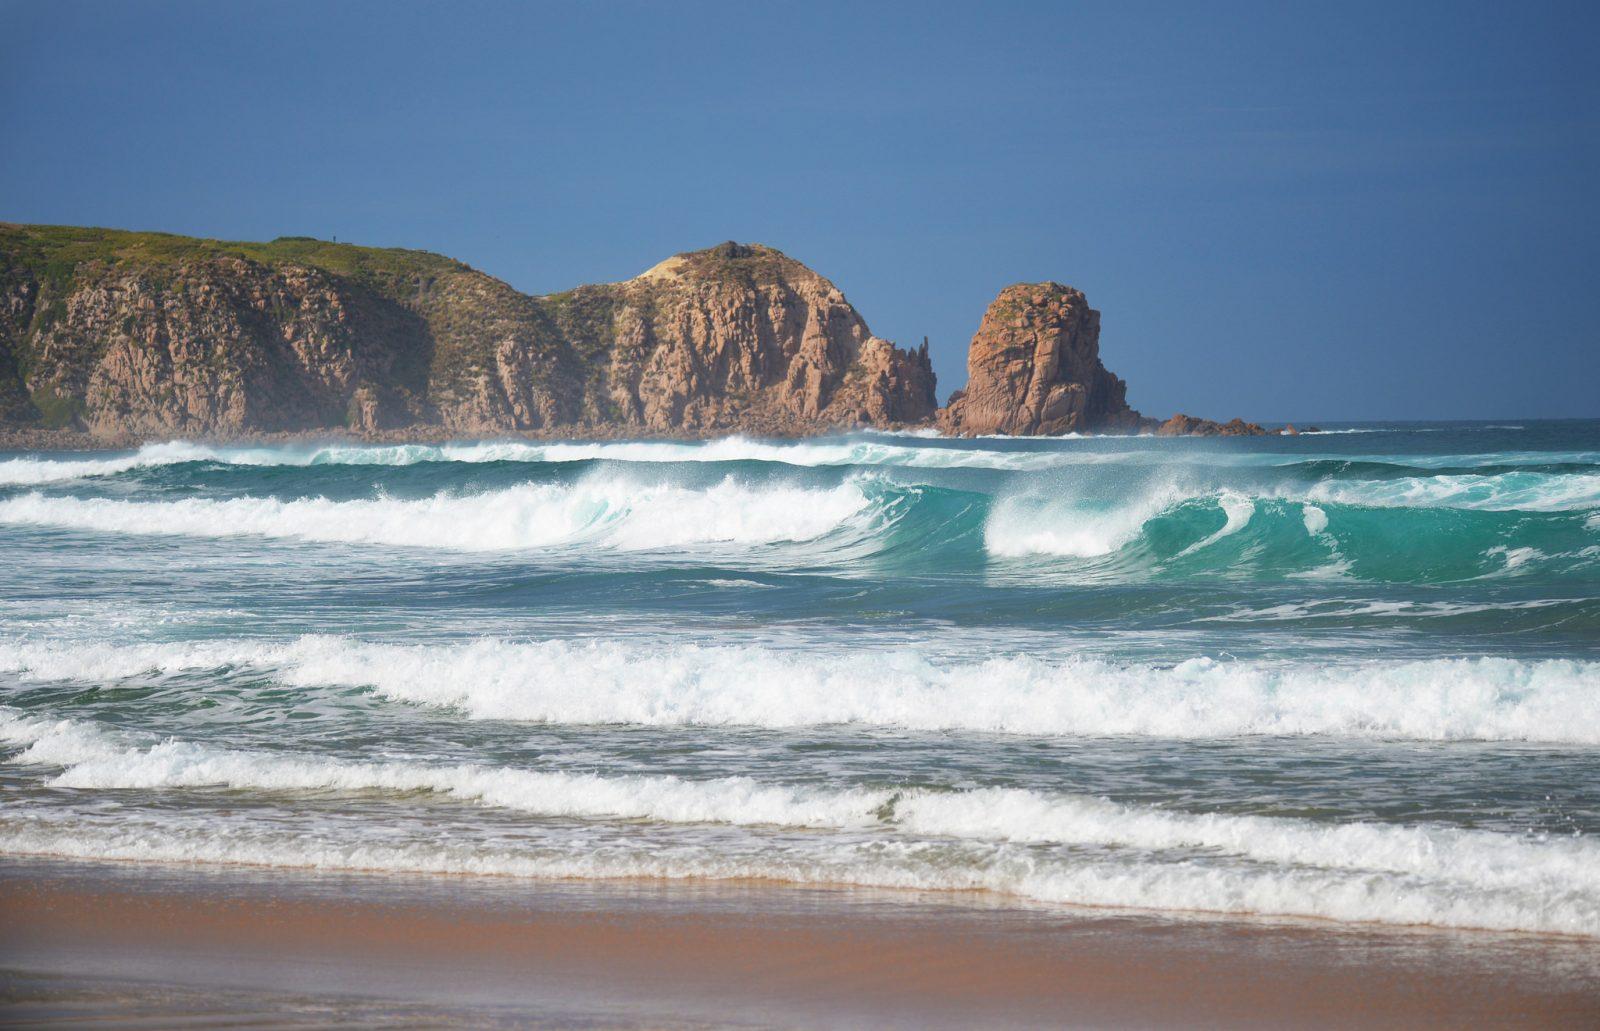 Melbourne day trips: Woolamai beach, Phillip Island